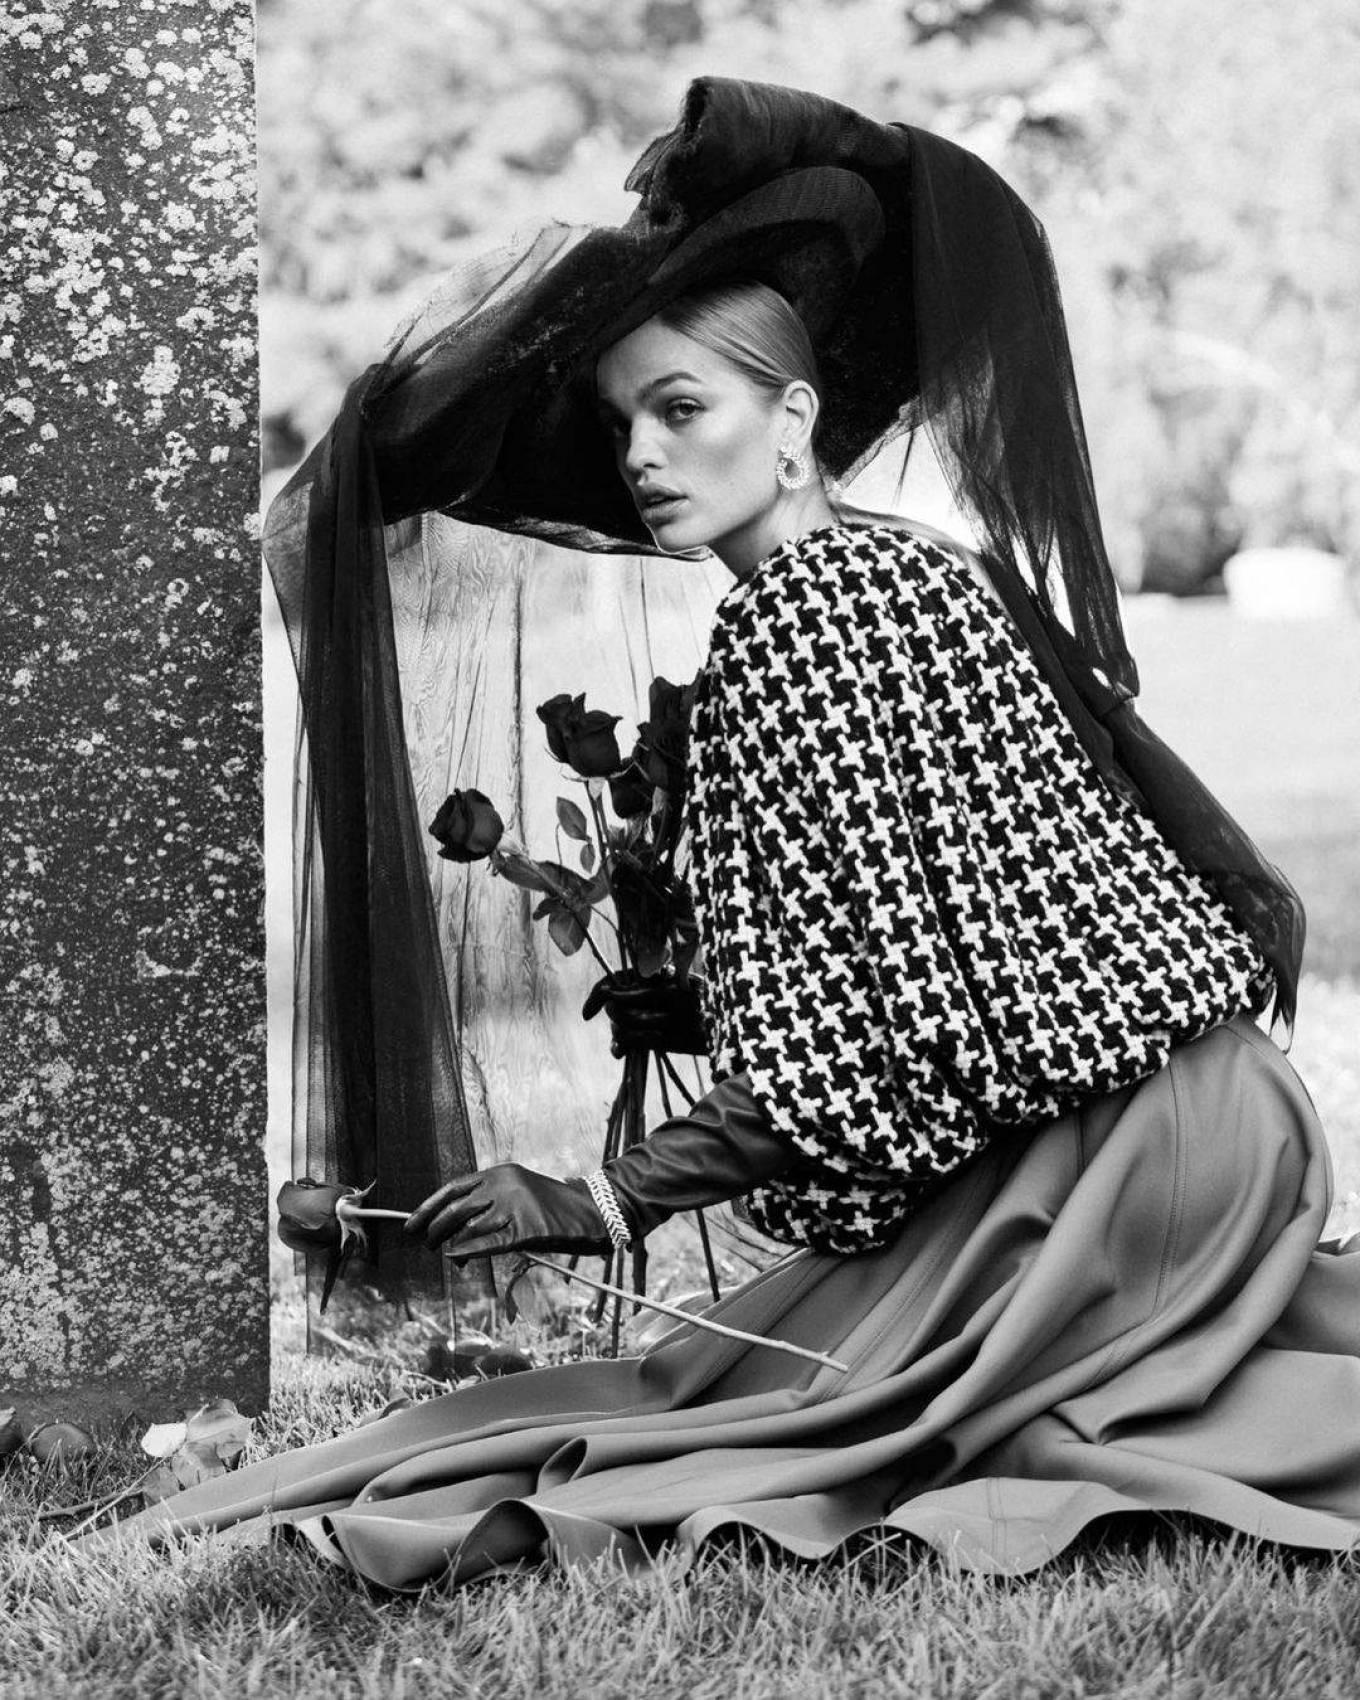 Daphne Groeneveld 2020 : Daphne Groeneveld – Harpers Bazaar (Russia – November 2020)-05